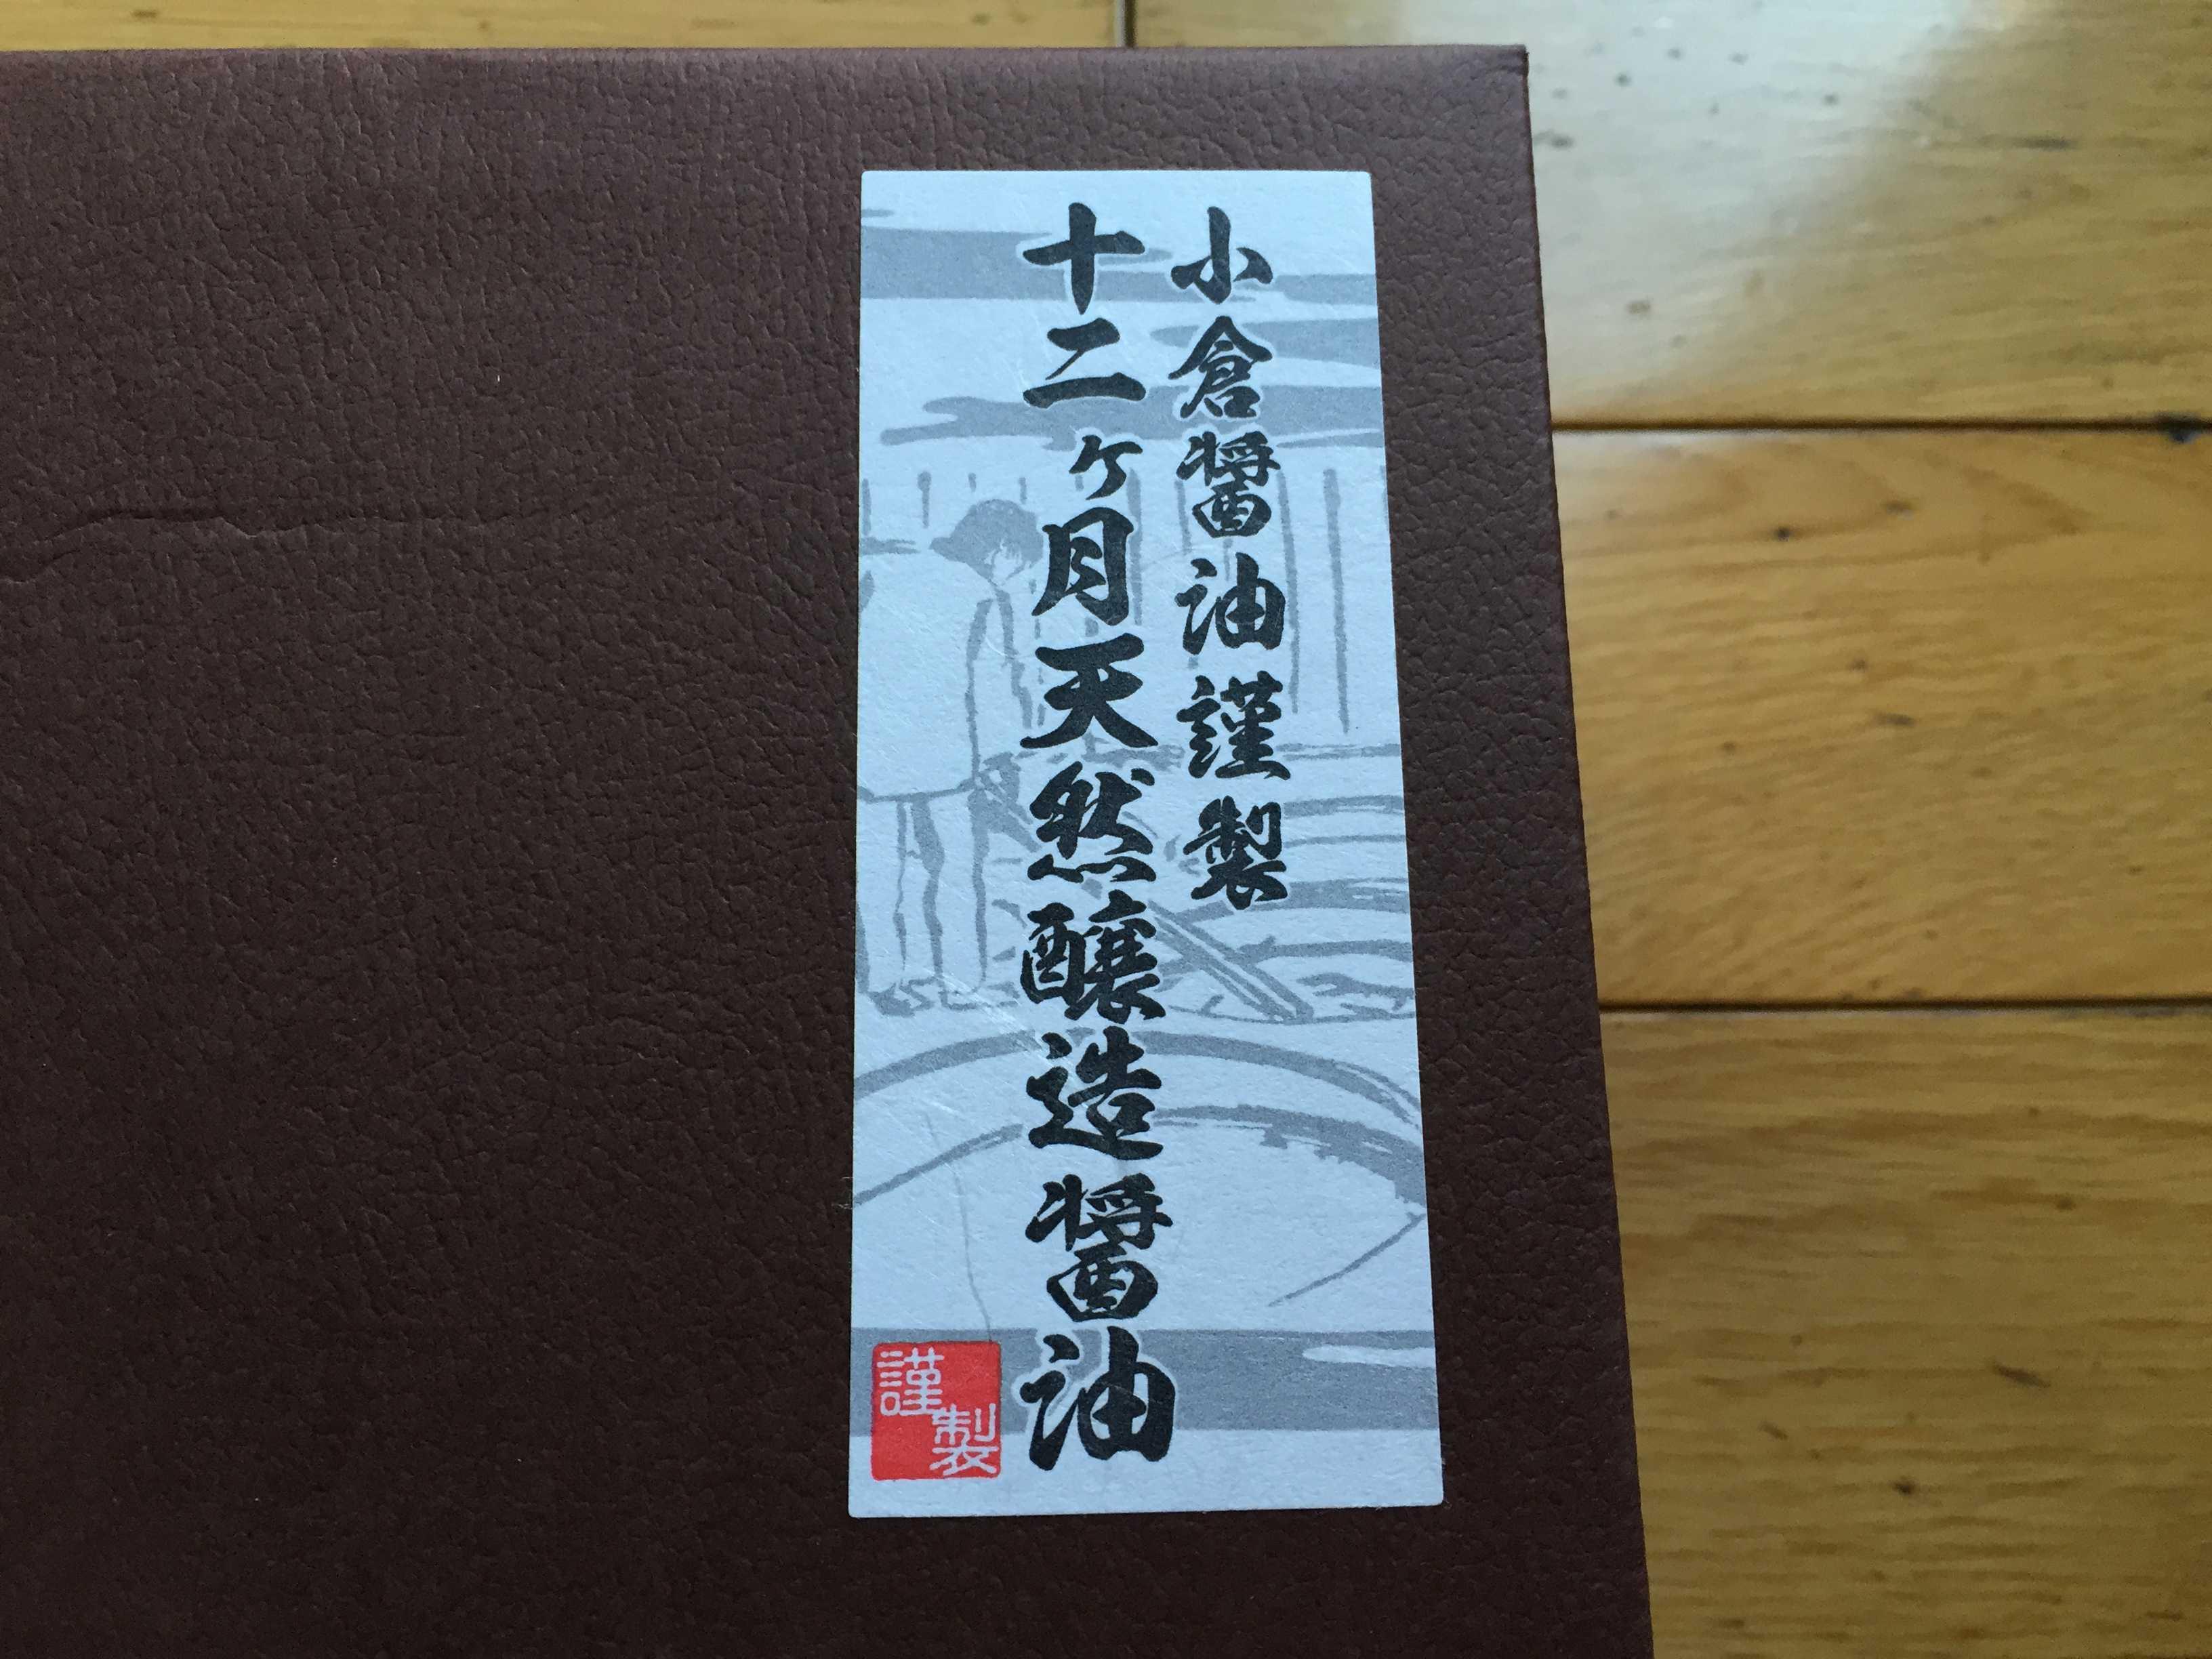 OGURA SoySauce - 十二ヶ月天然醸造醤油